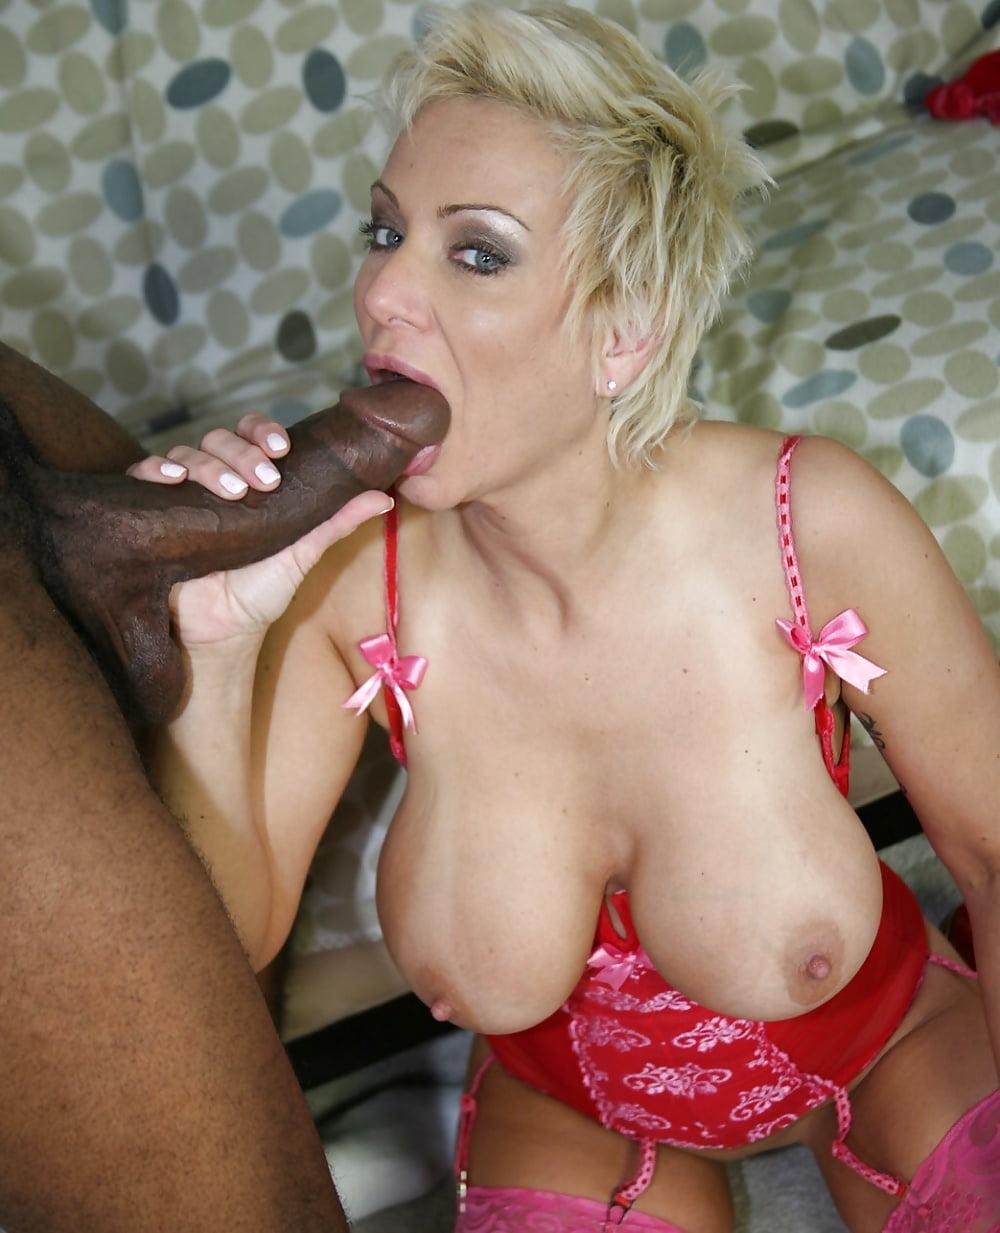 Black Milf Porn And Nude Ebony Cougar Galleries